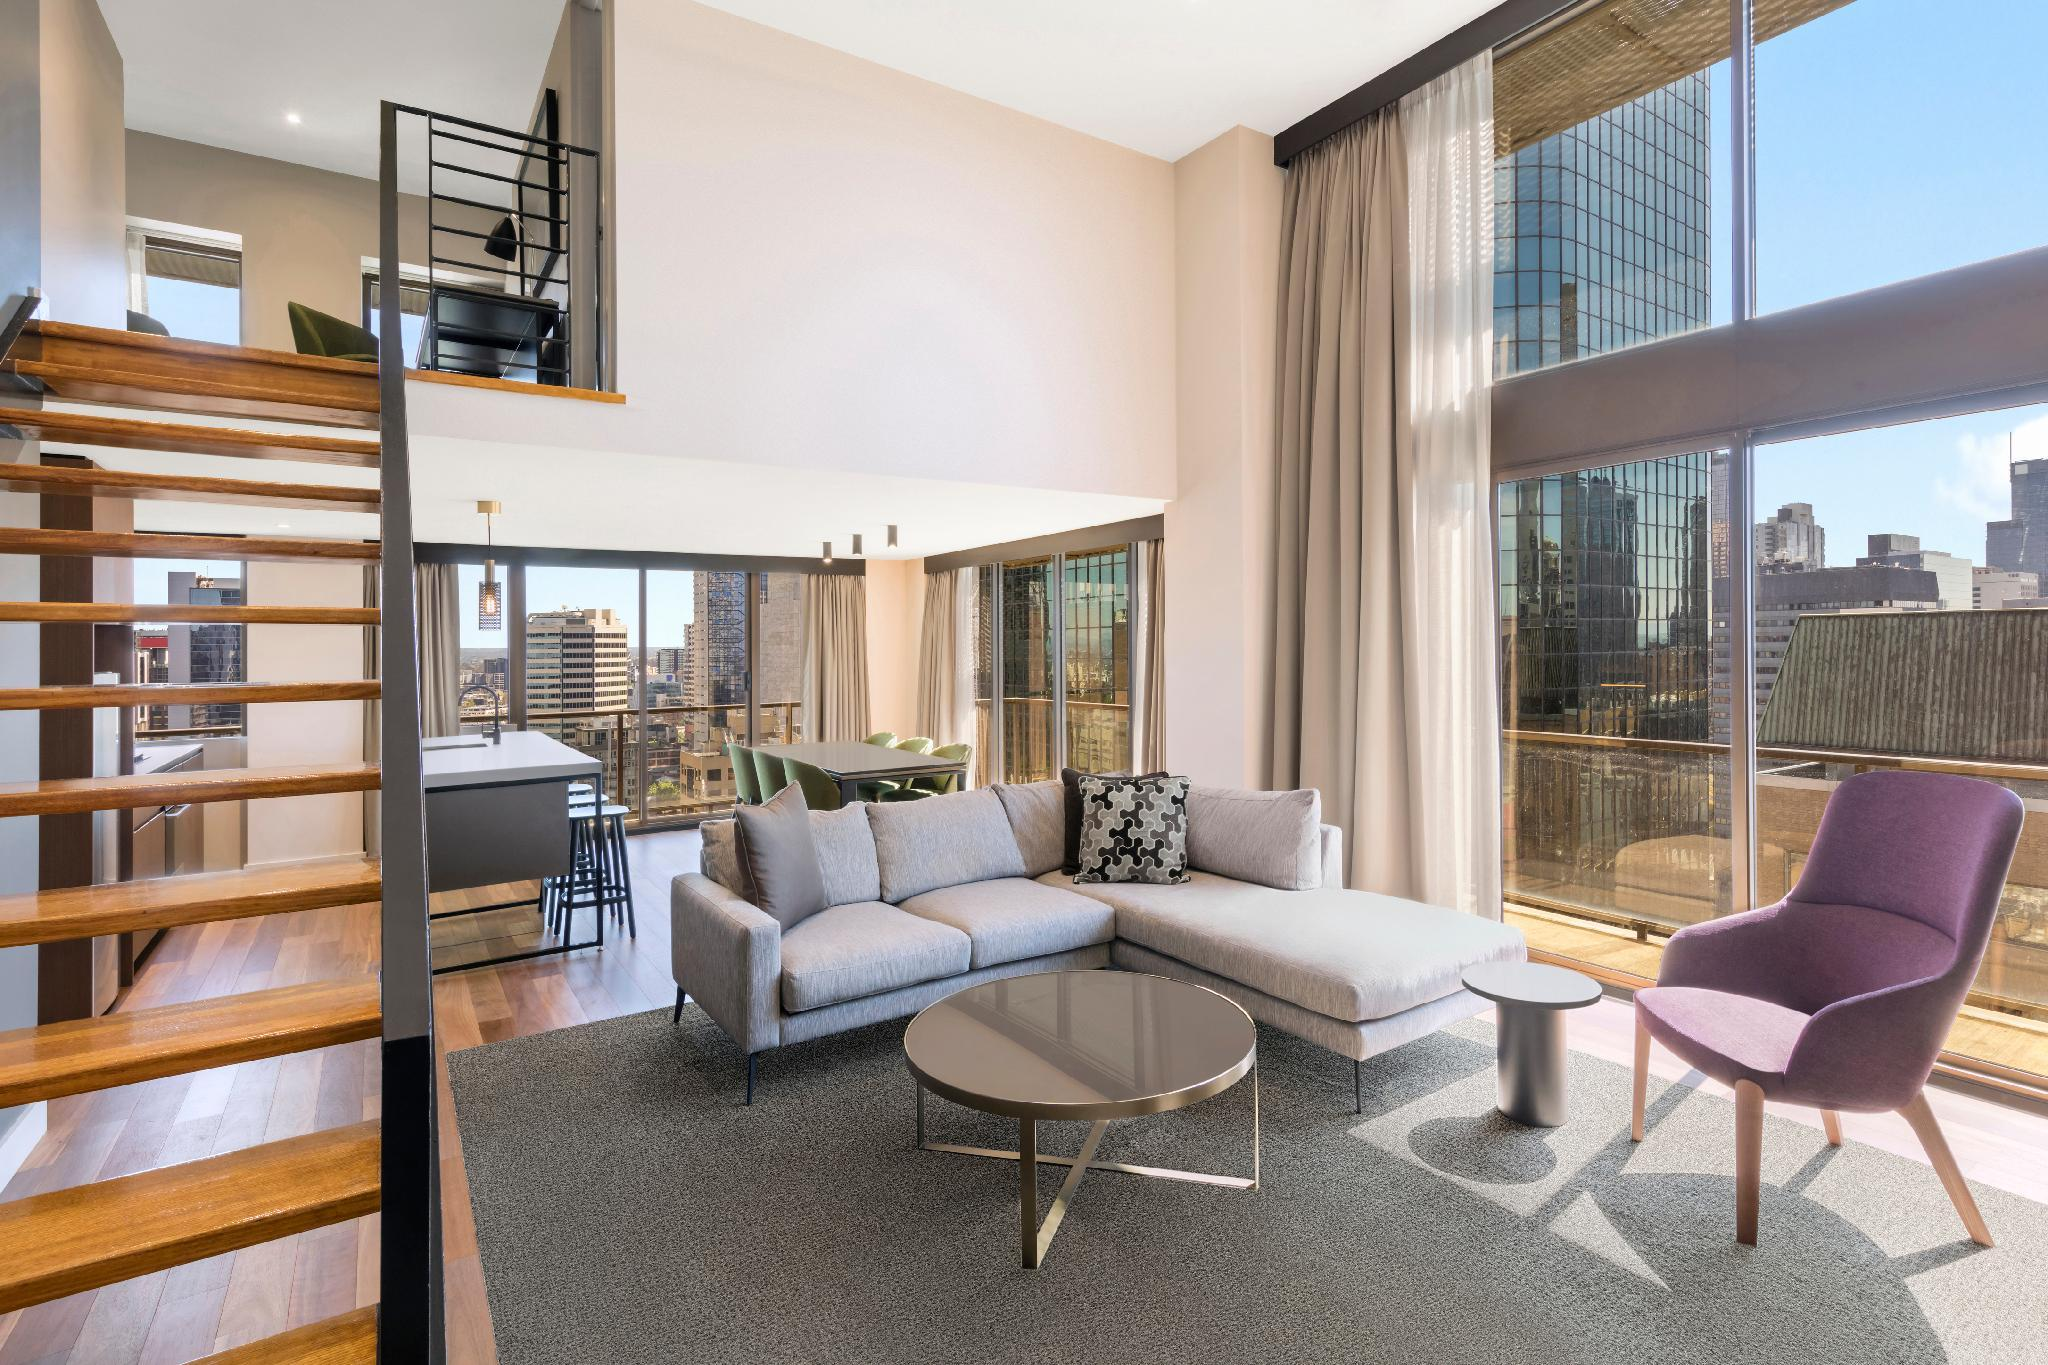 Adina Apartment Hotel Melbourne Serviced apartment - Deals ...